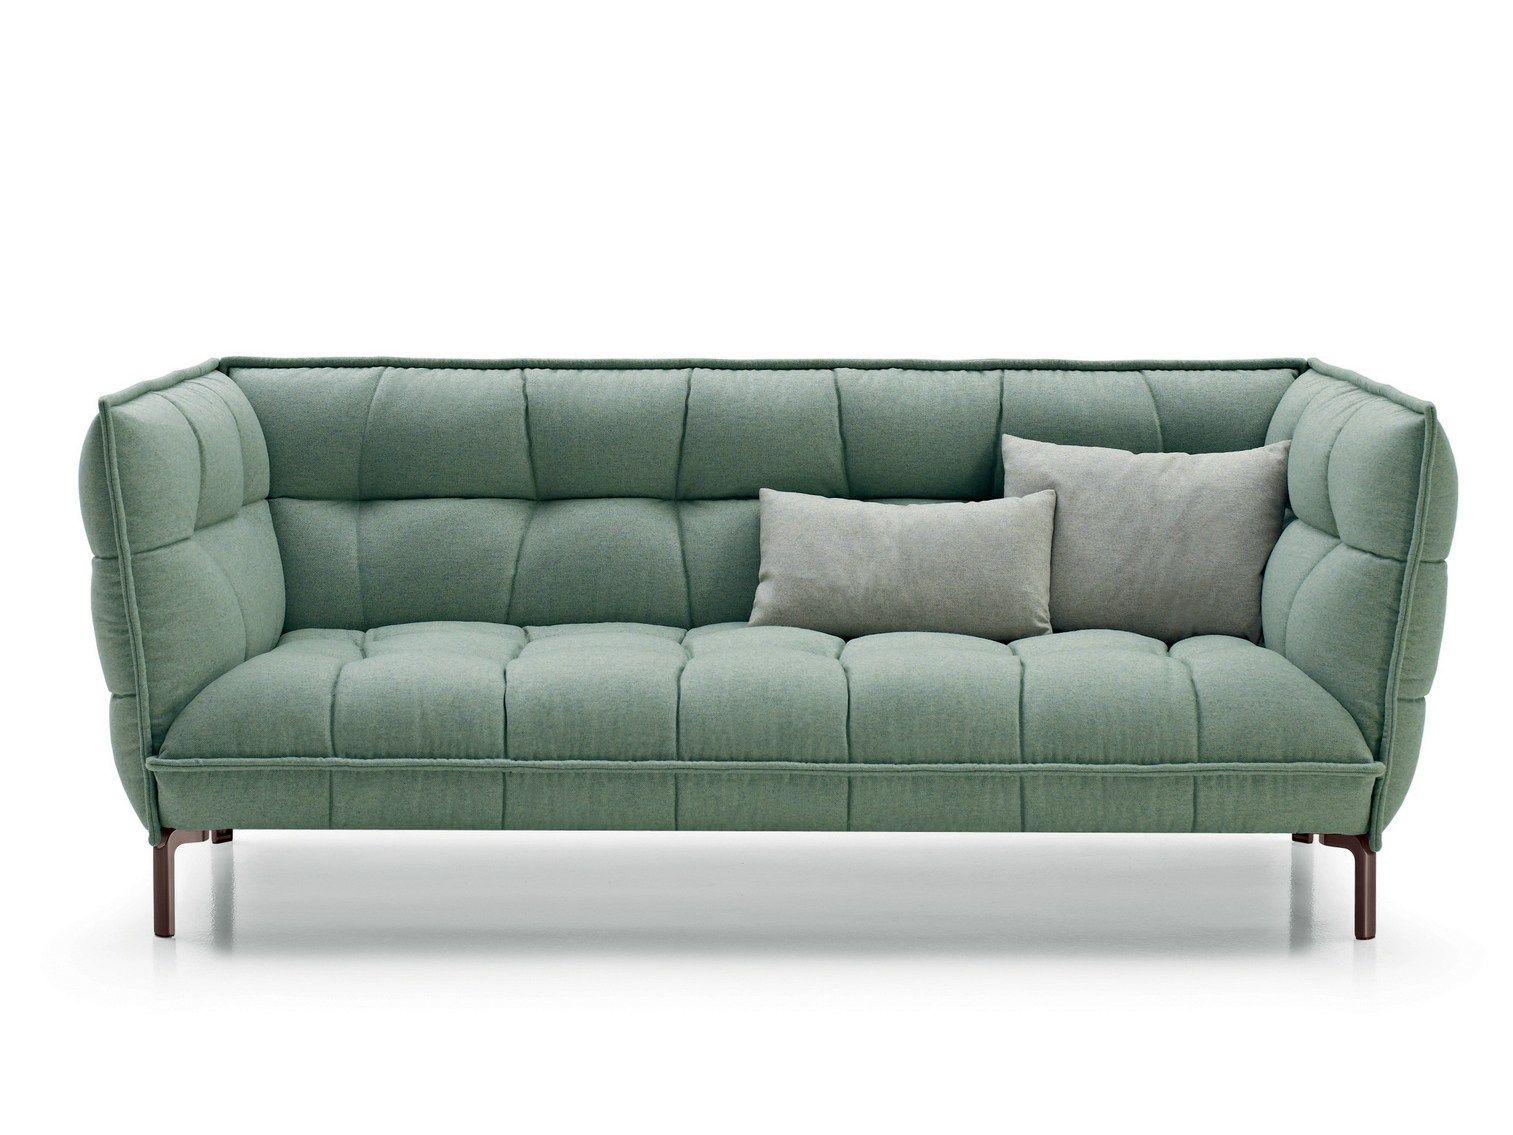 Tufted Upholstered Fabric Sofa Husk Sofa Husk Collection By B B Italia Design Patricia Urquiola Sofa Furniture Fabric Sofa Design Sofa Design